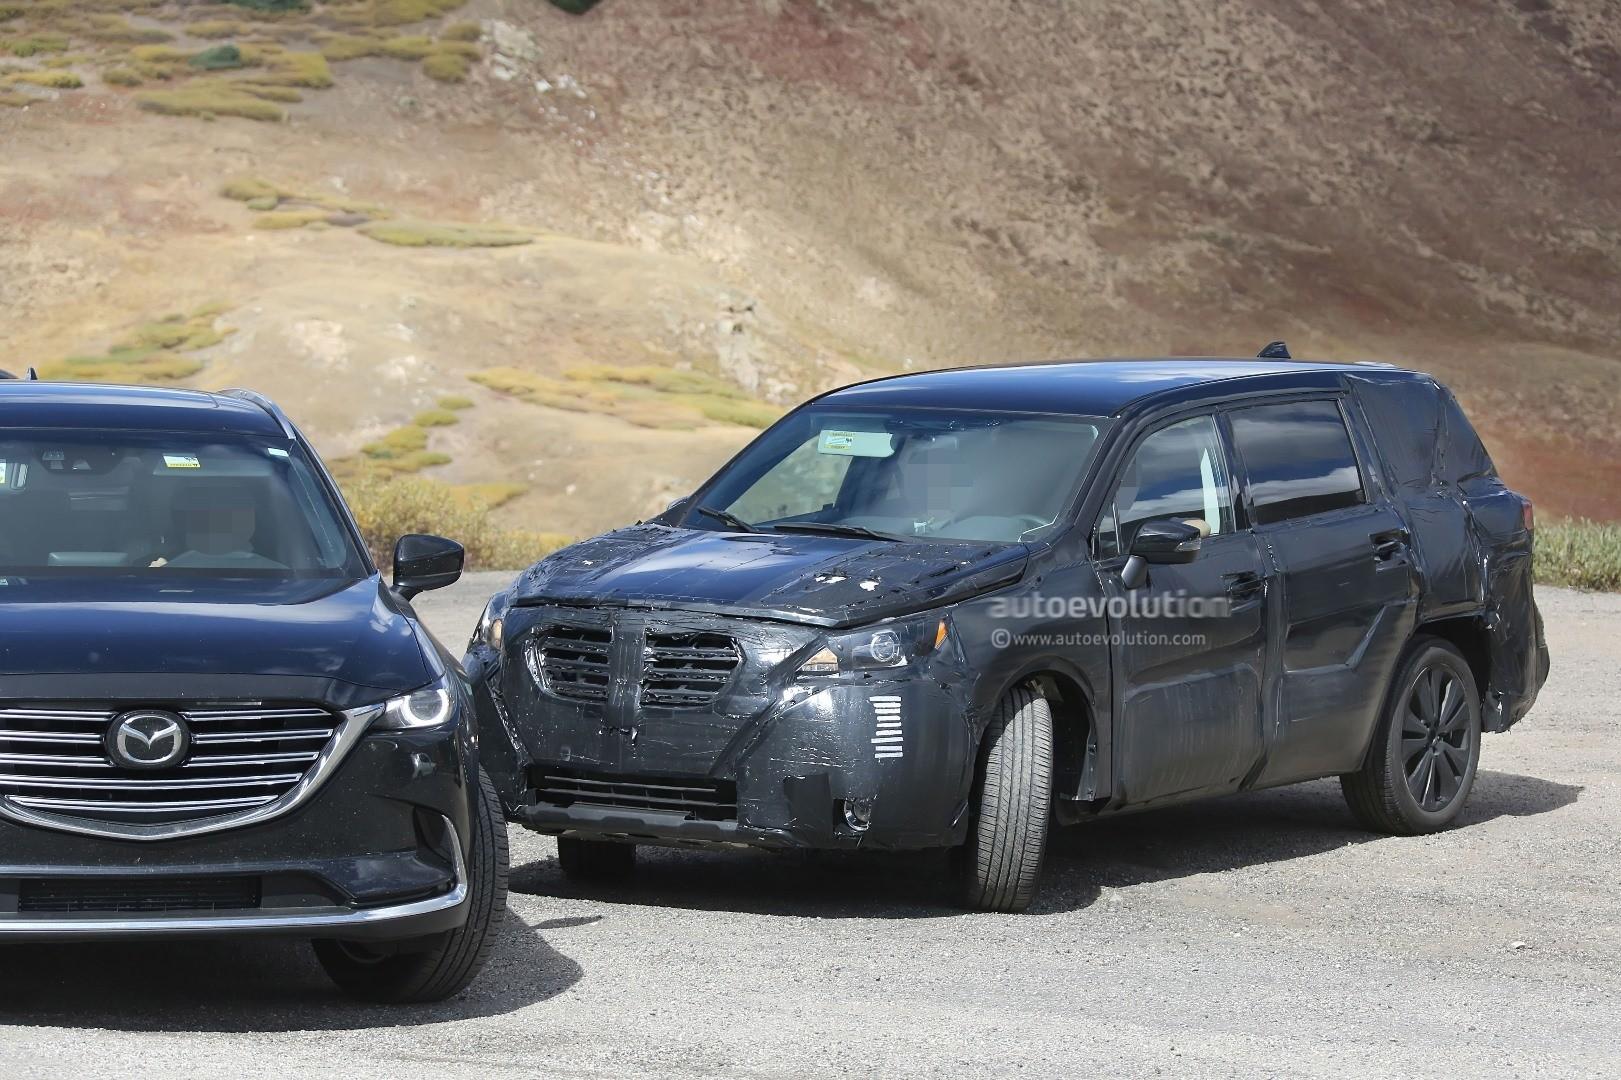 Used 2016 Ford Explorer >> 2019 Subaru Tribeca Heir Spied Benchmarking Against Mazda CX-9, Ford Explorer - autoevolution